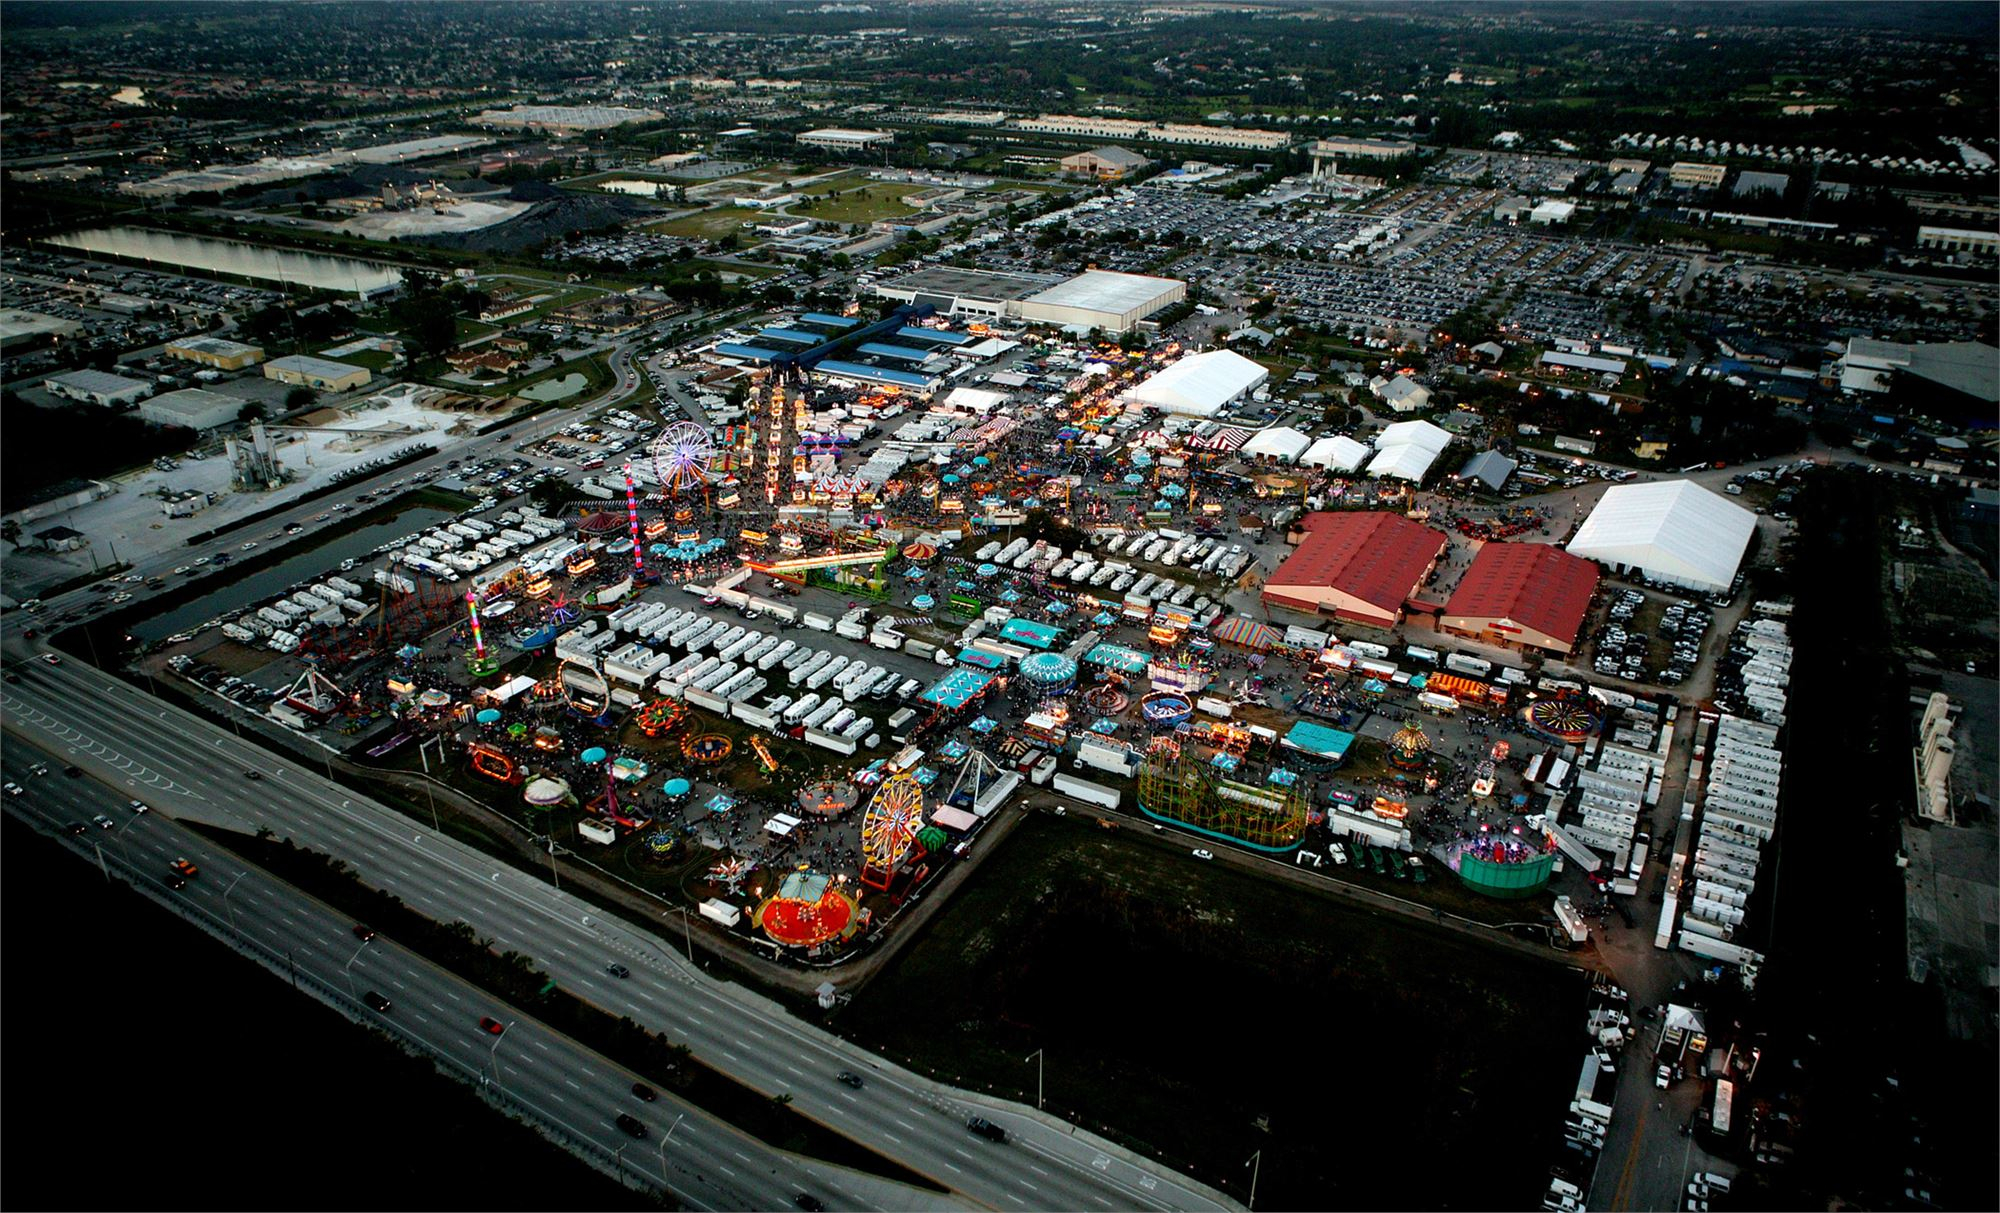 South Florida Fair | West Palm Beach, Fl | 561.793.0333 within Events South Florida Fair Grounds